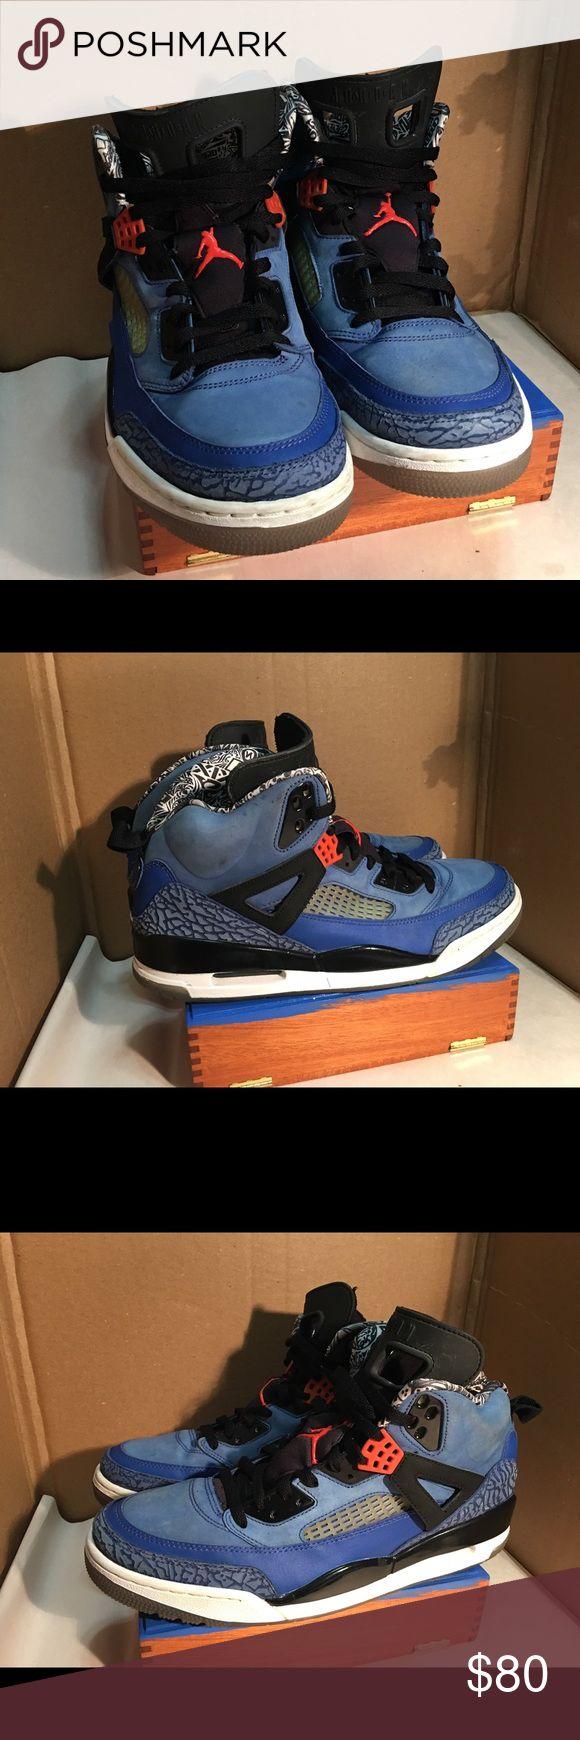 Air Jordan Spizike (New York Knicks) Air Jordan Spizike